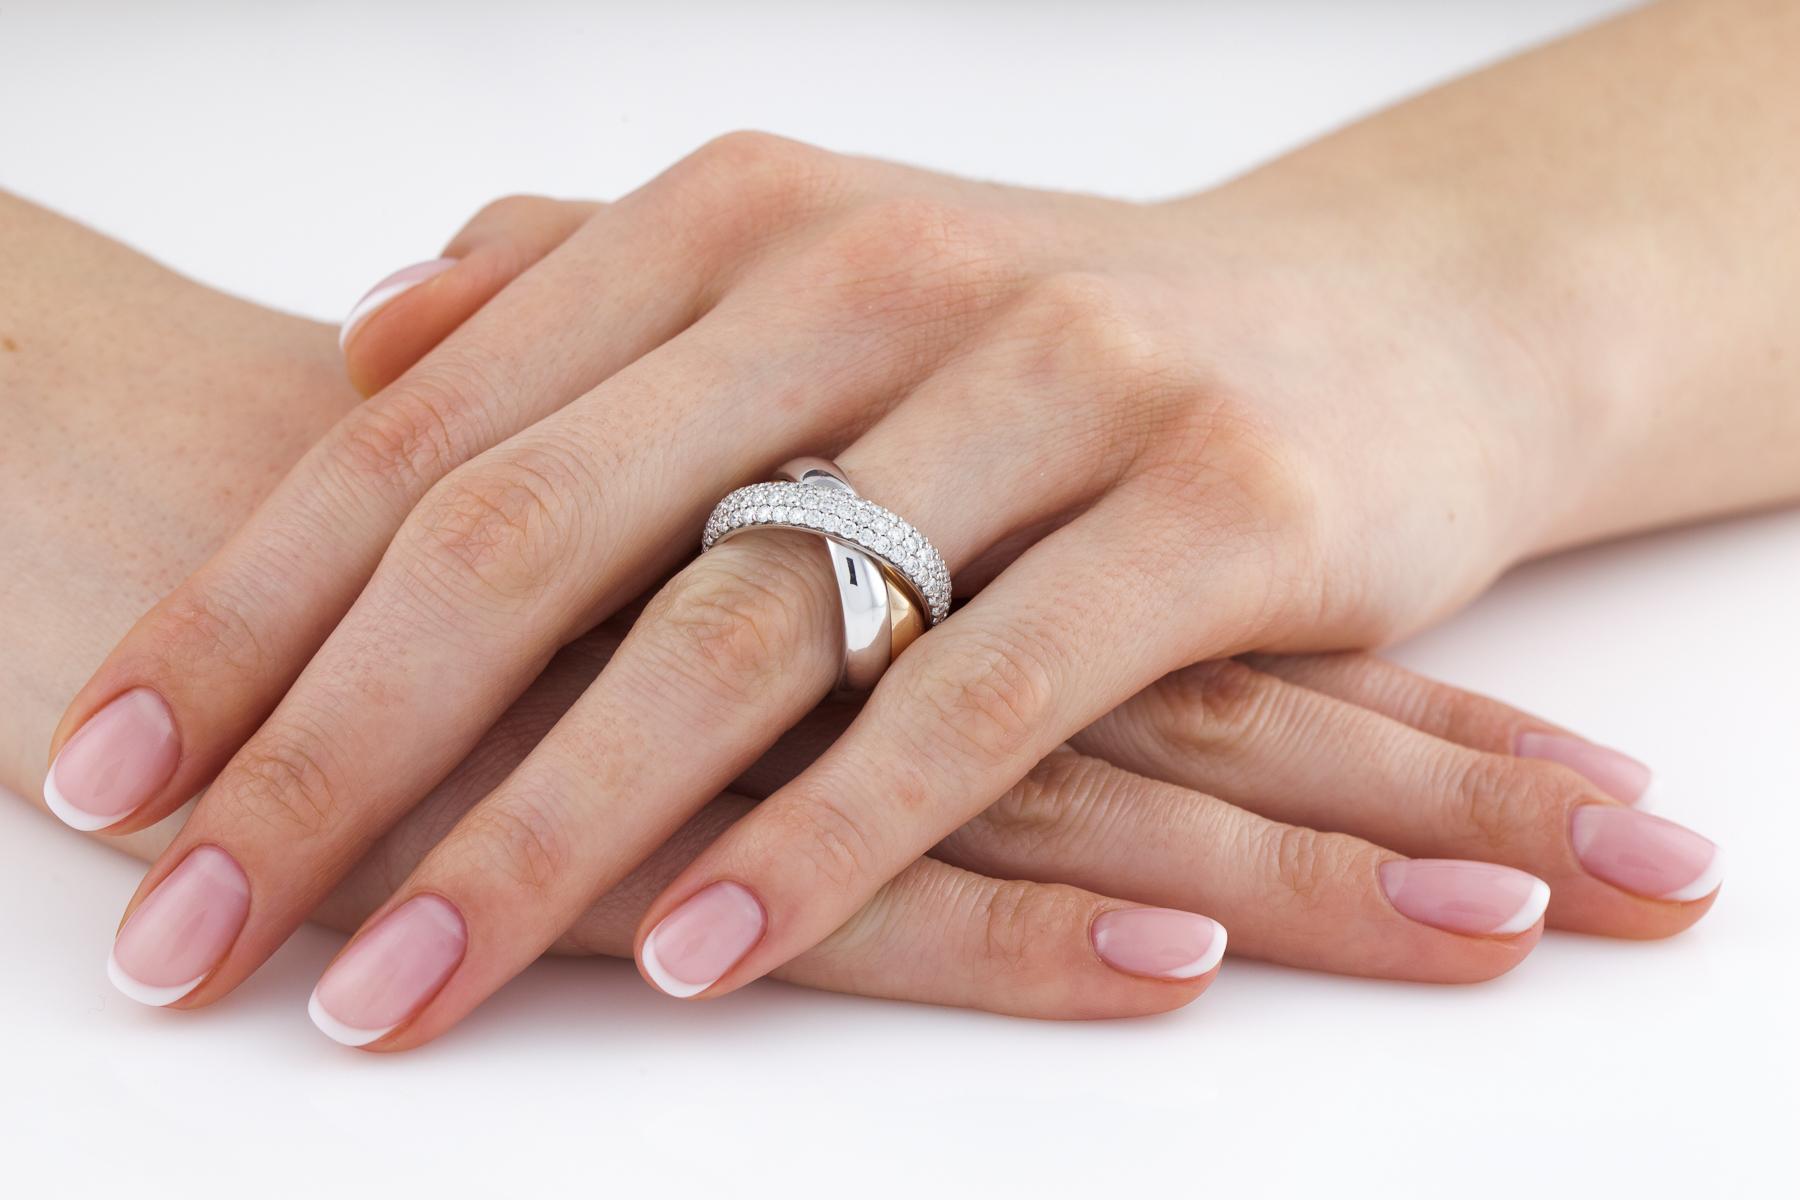 Verigheta cu Diamant Dama Aur Alb, Galben si Roz de18kt, Stil Russian, Format din 3 Verighete Interconectate si Diamante Mici Rotund Briliant, Latime 5mm-img1